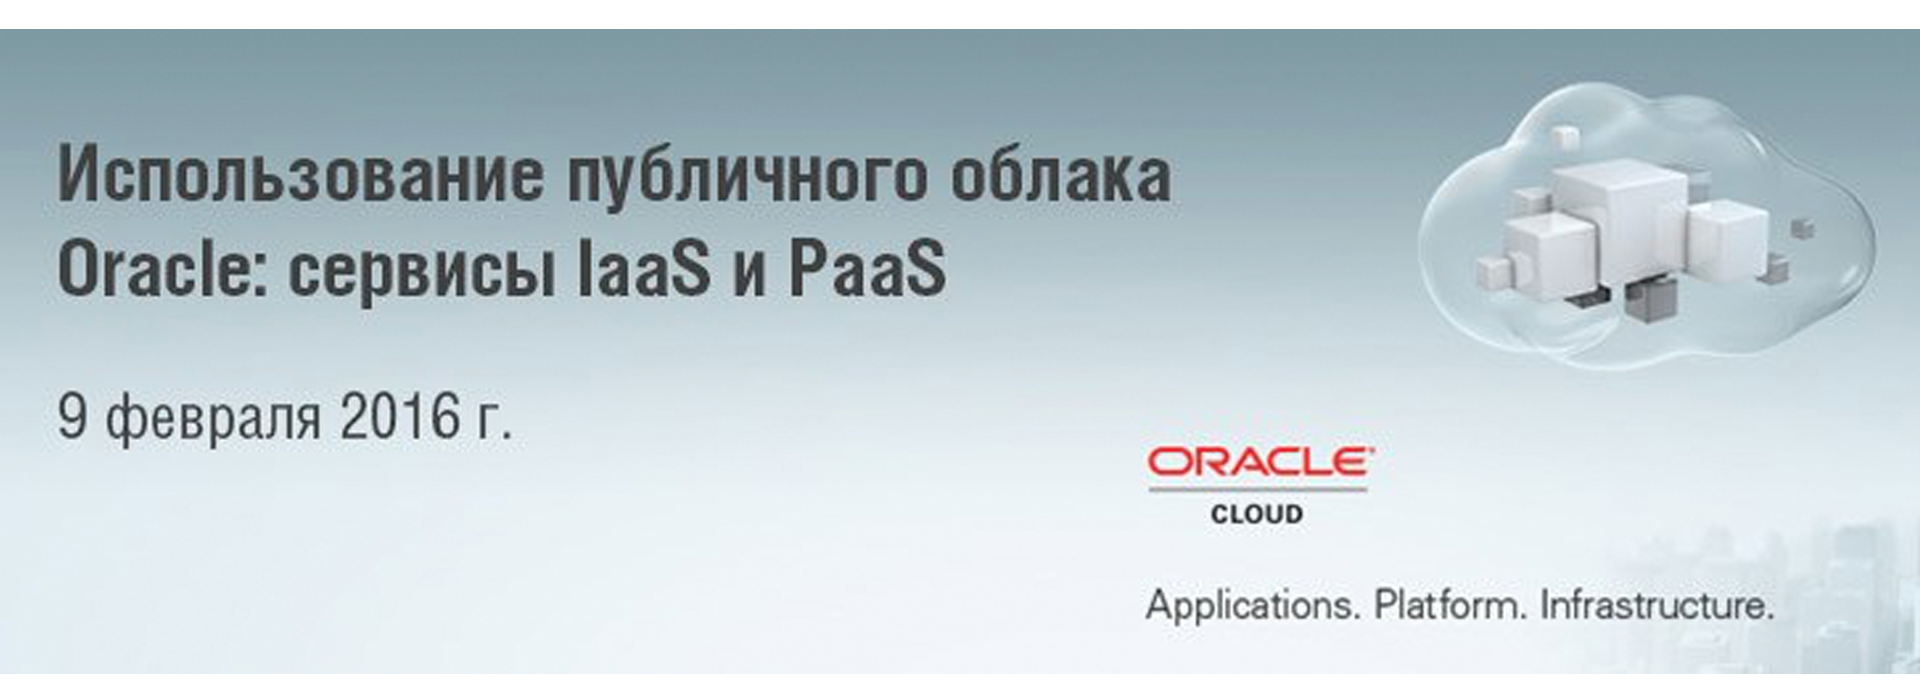 Регистрация на вебинар «Использование публичного облака Oracle: сервисы Iaa ...